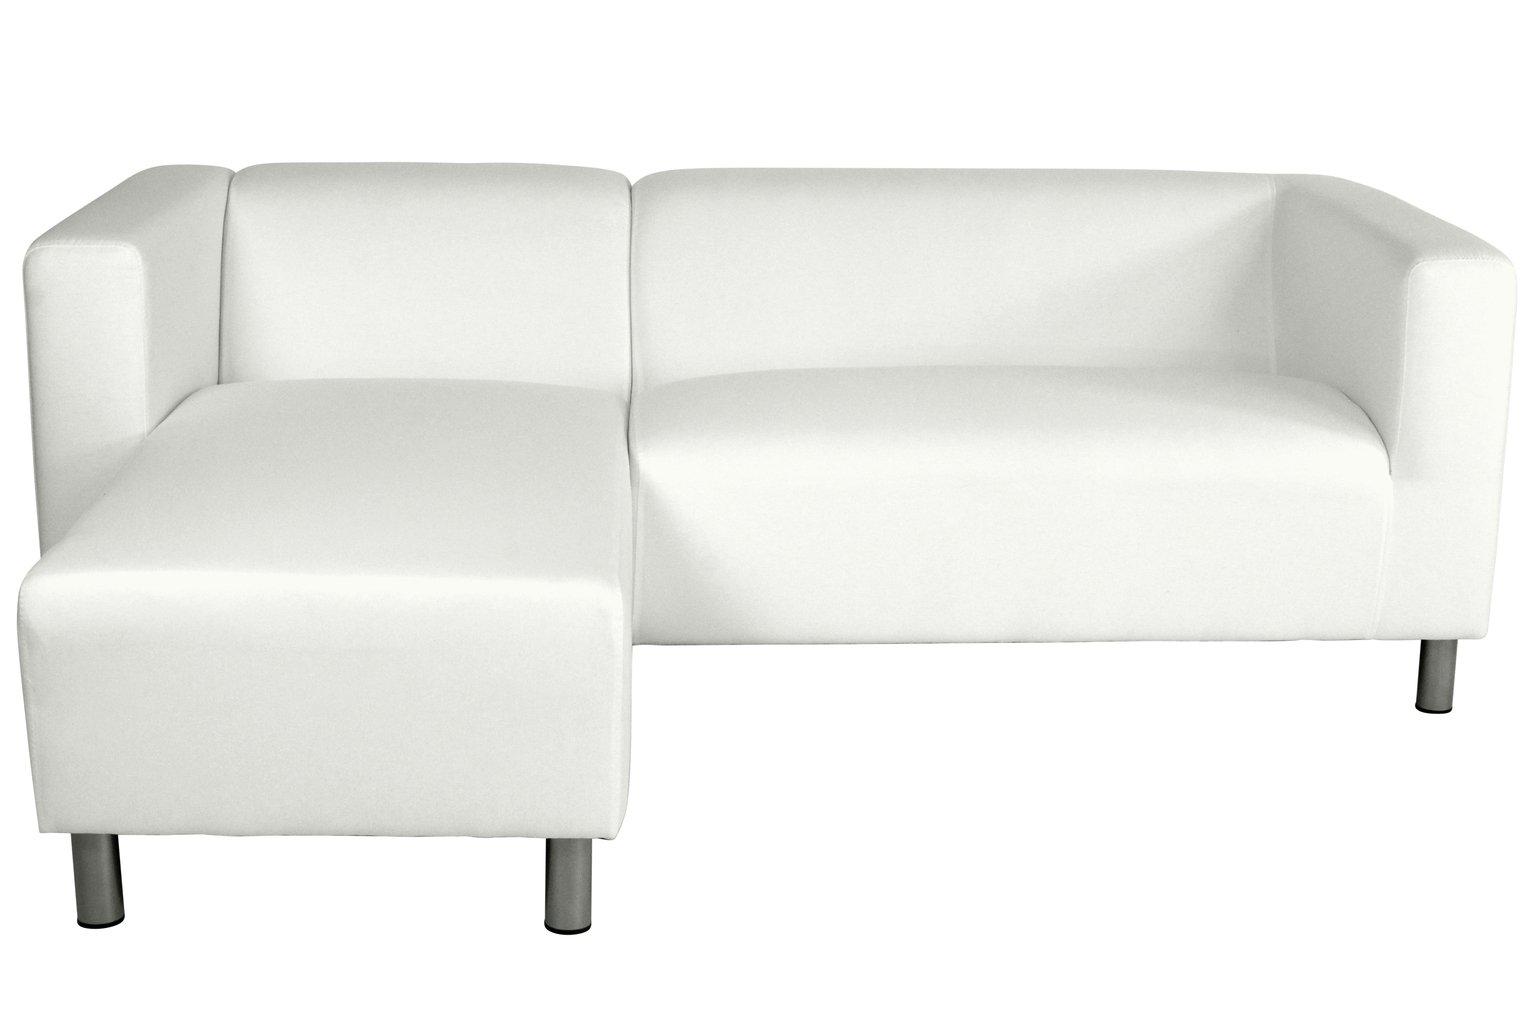 Argos Home Moda Left Corner Fabric Sofa - White